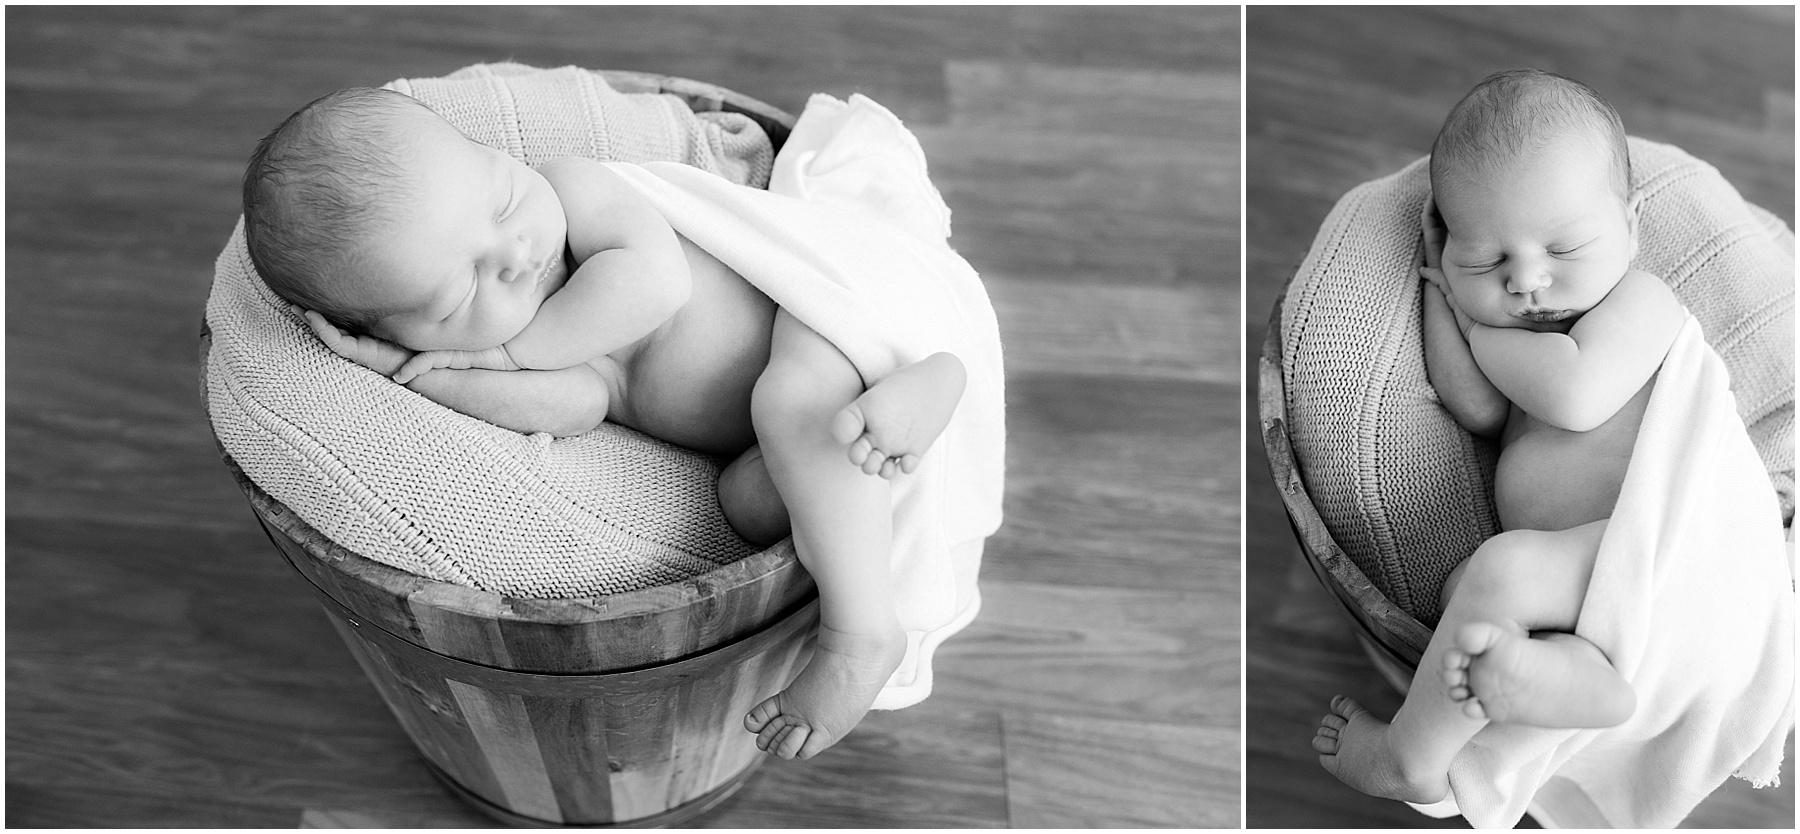 Newborn baby boy swaddled in a bucket, Indianapolis Newborn Photography, Raindancer Studios